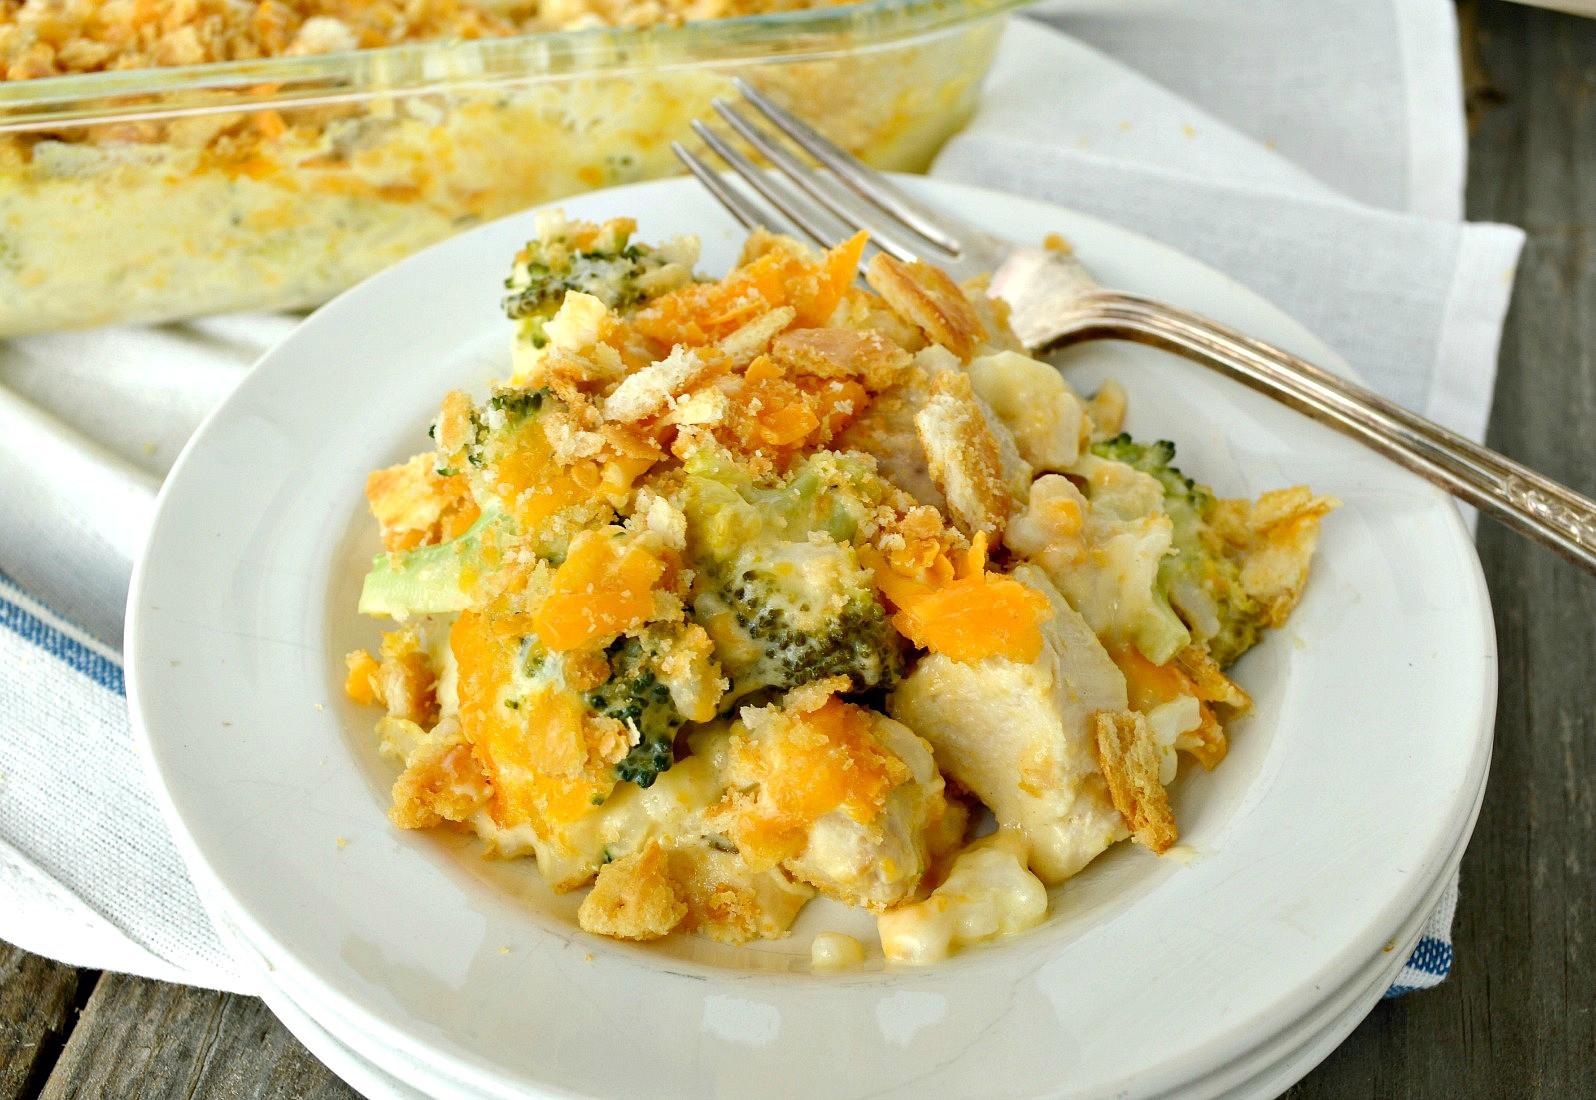 Chicken Broccoli Recipe  Chicken Broccoli Rice Casserole Easy fort Food Your